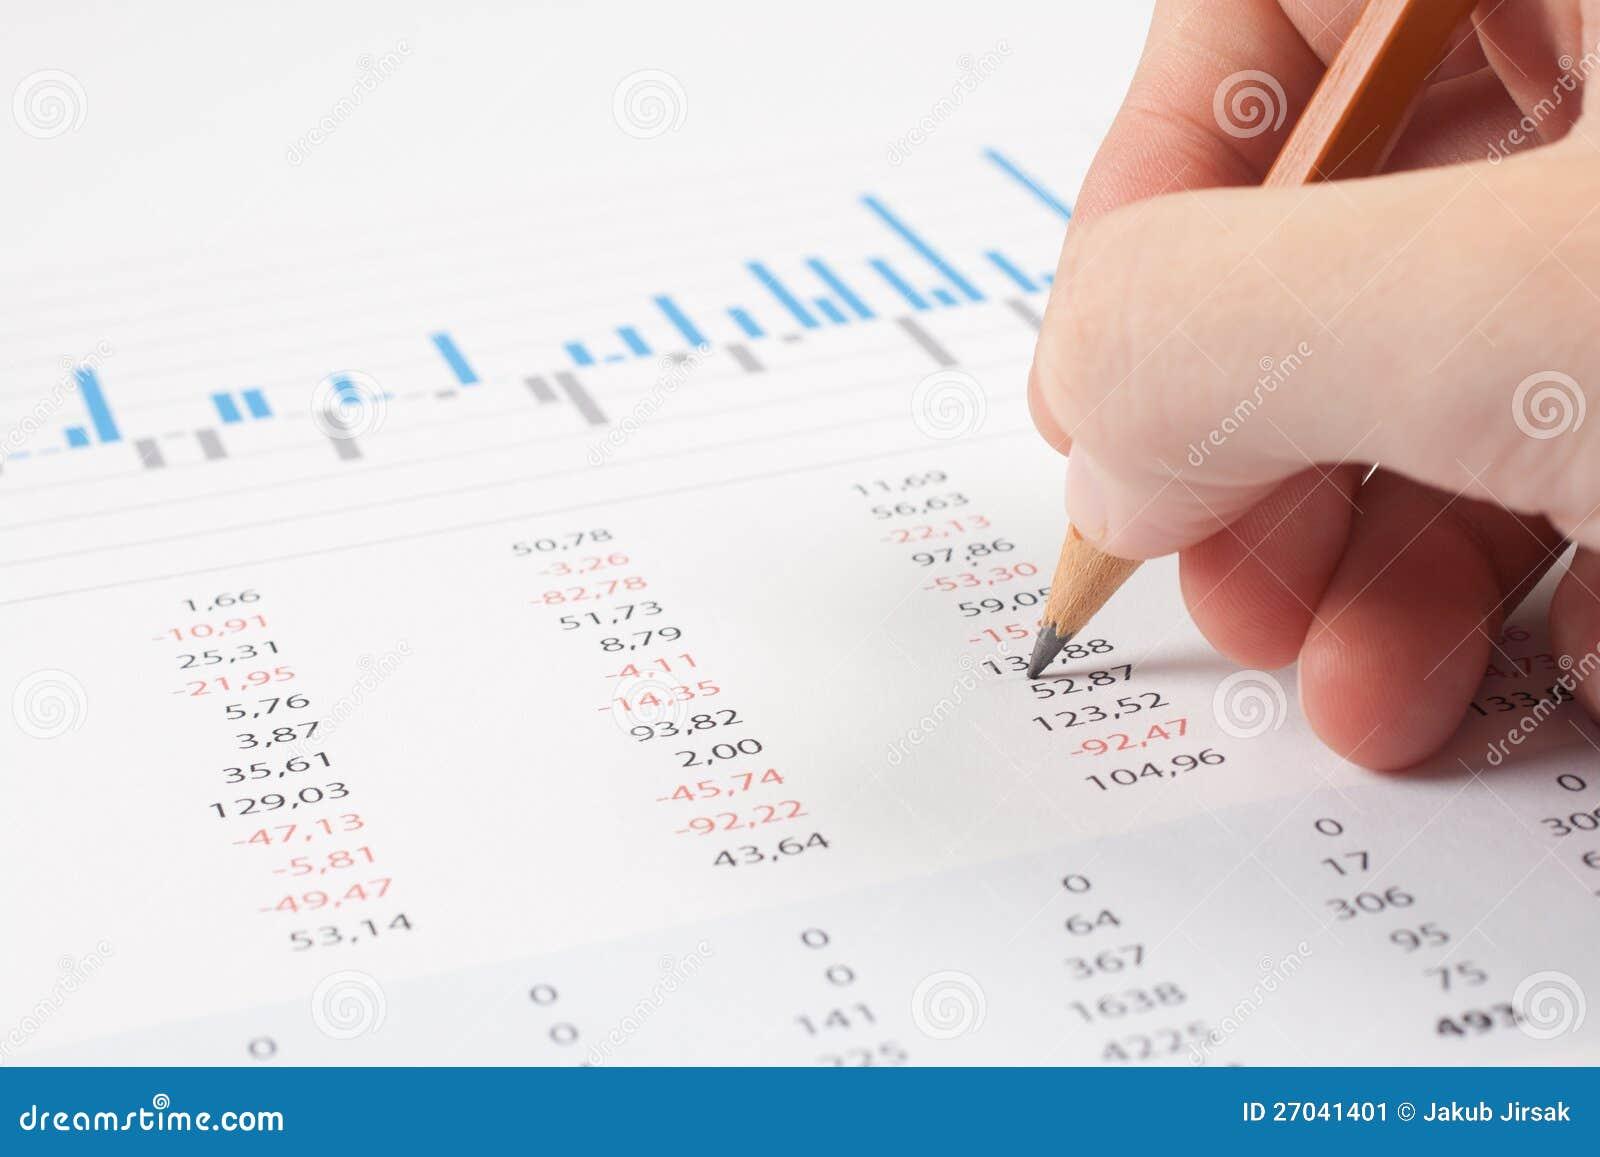 Business report analysis